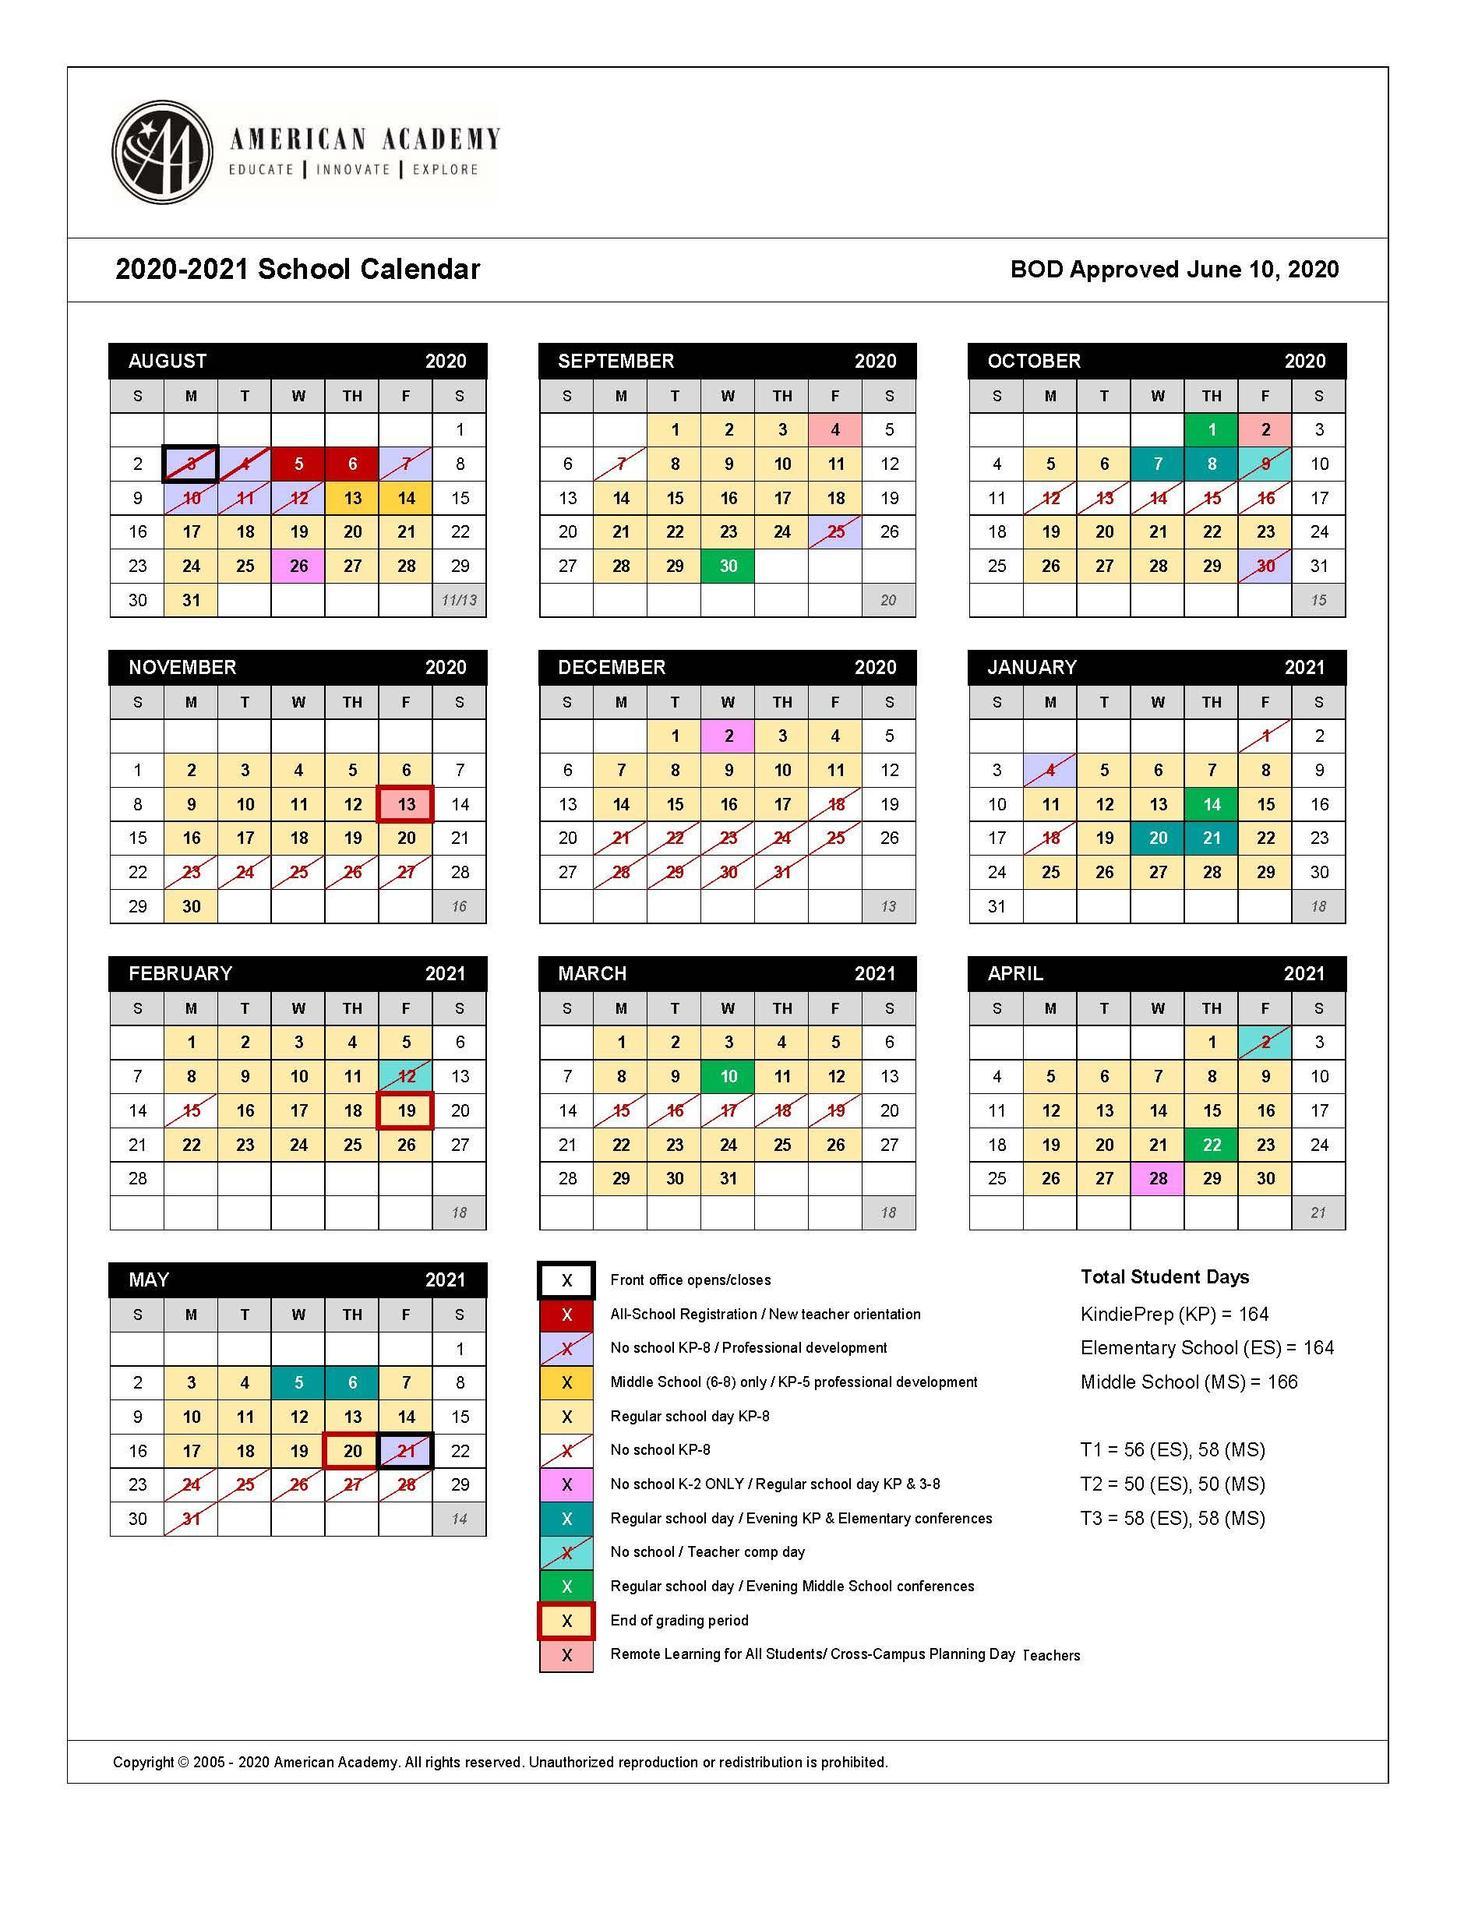 Picture of 20-21 School Calendar